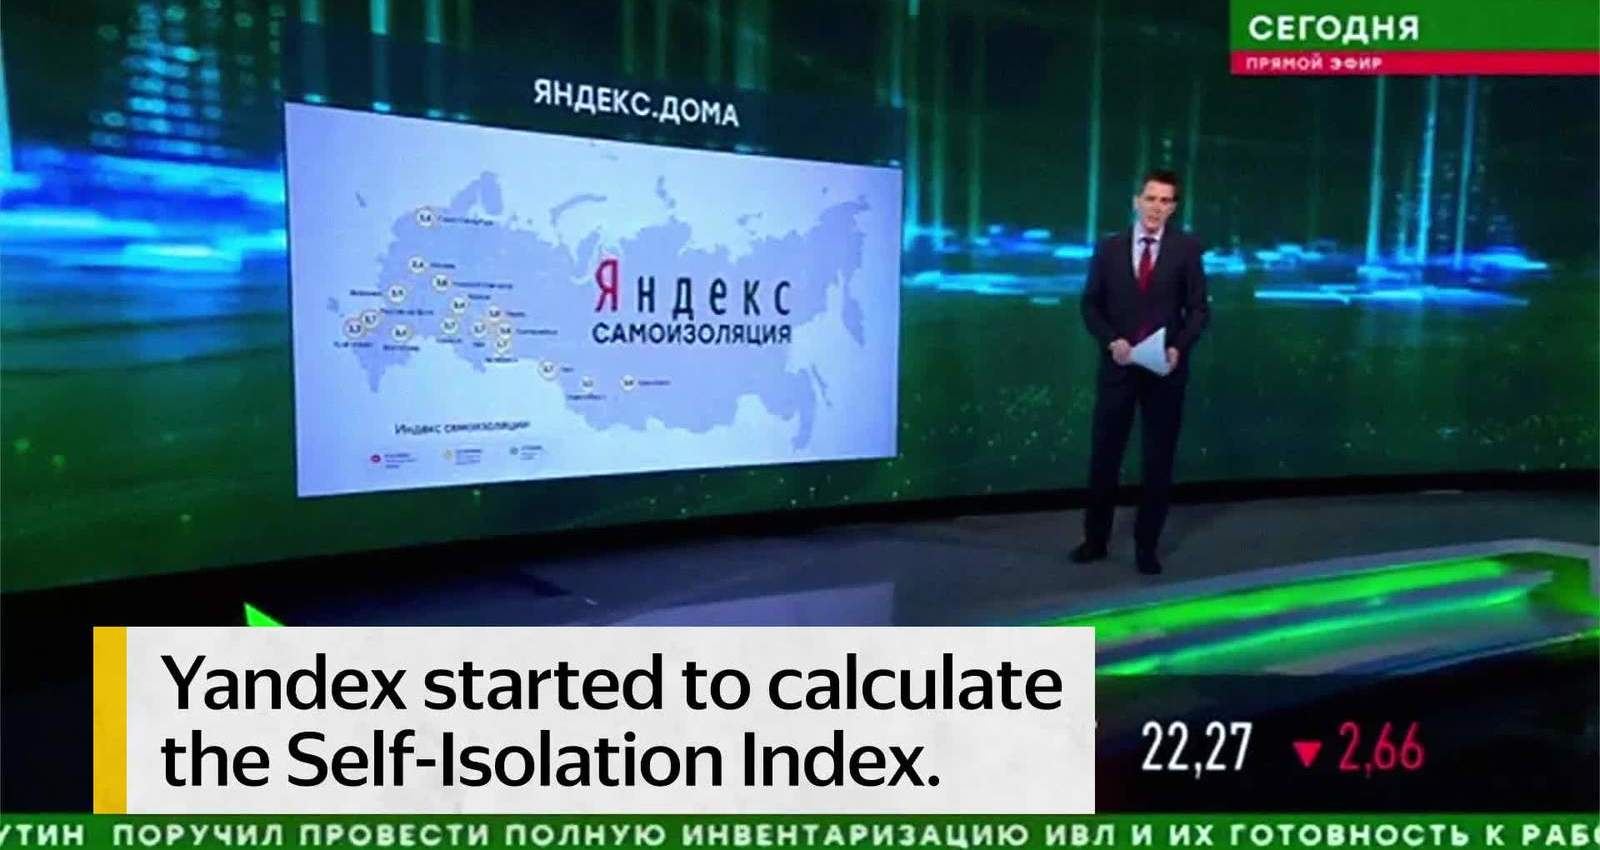 Self-Isolation Index